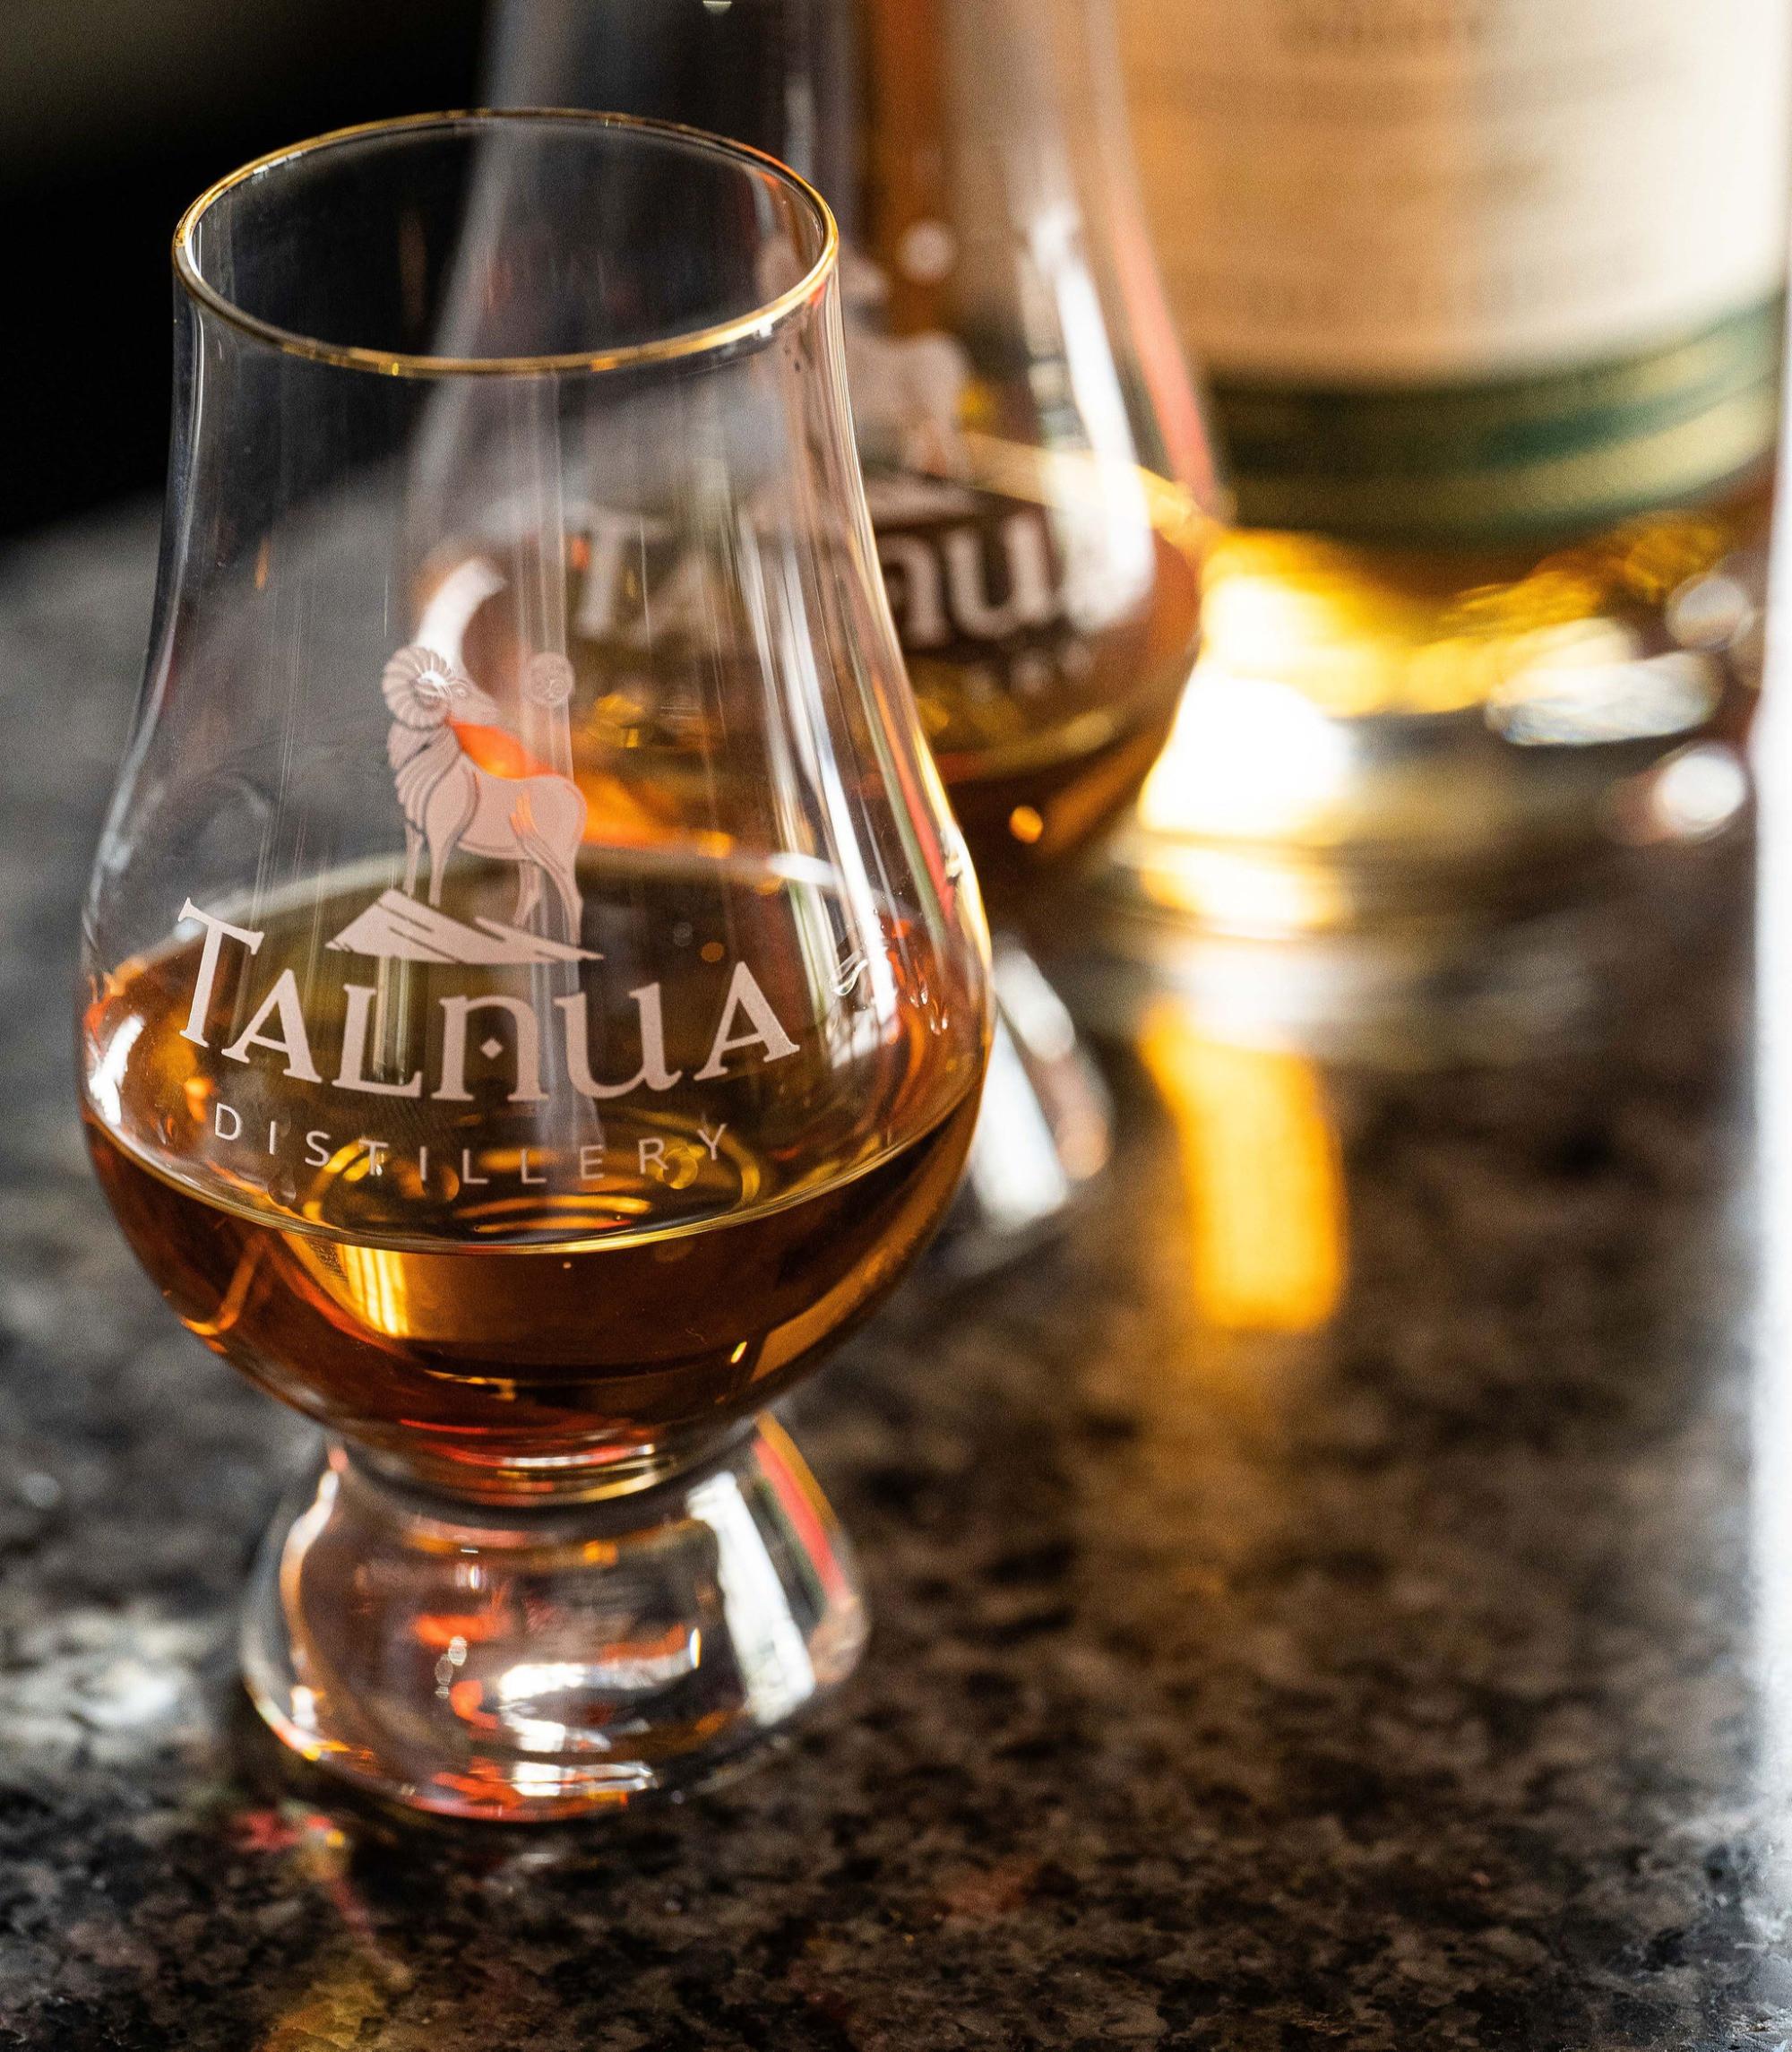 Talnua Distillery Guided Tasting